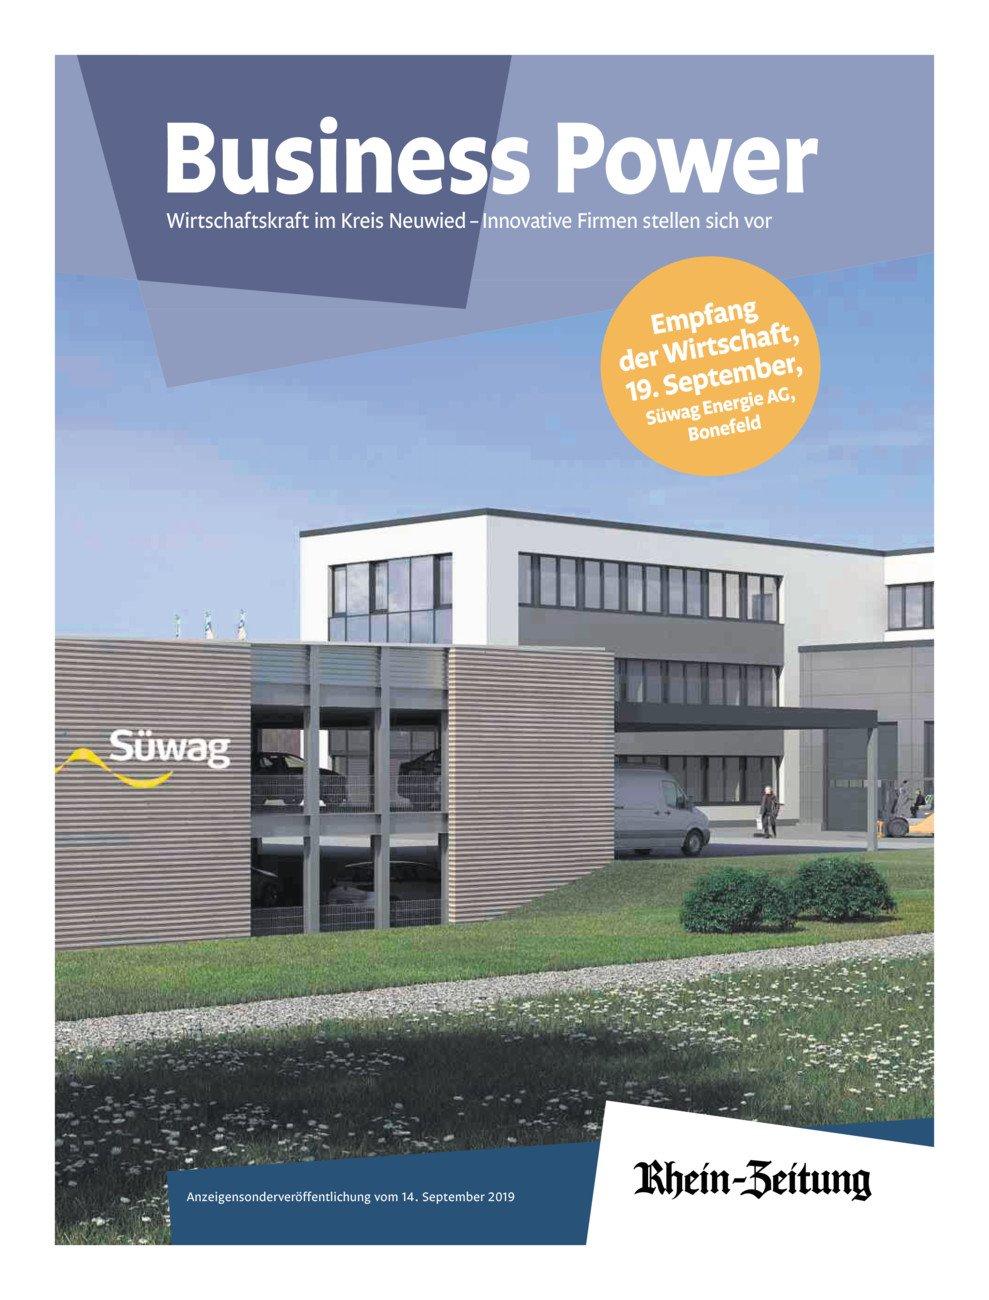 Business Power 2019 A